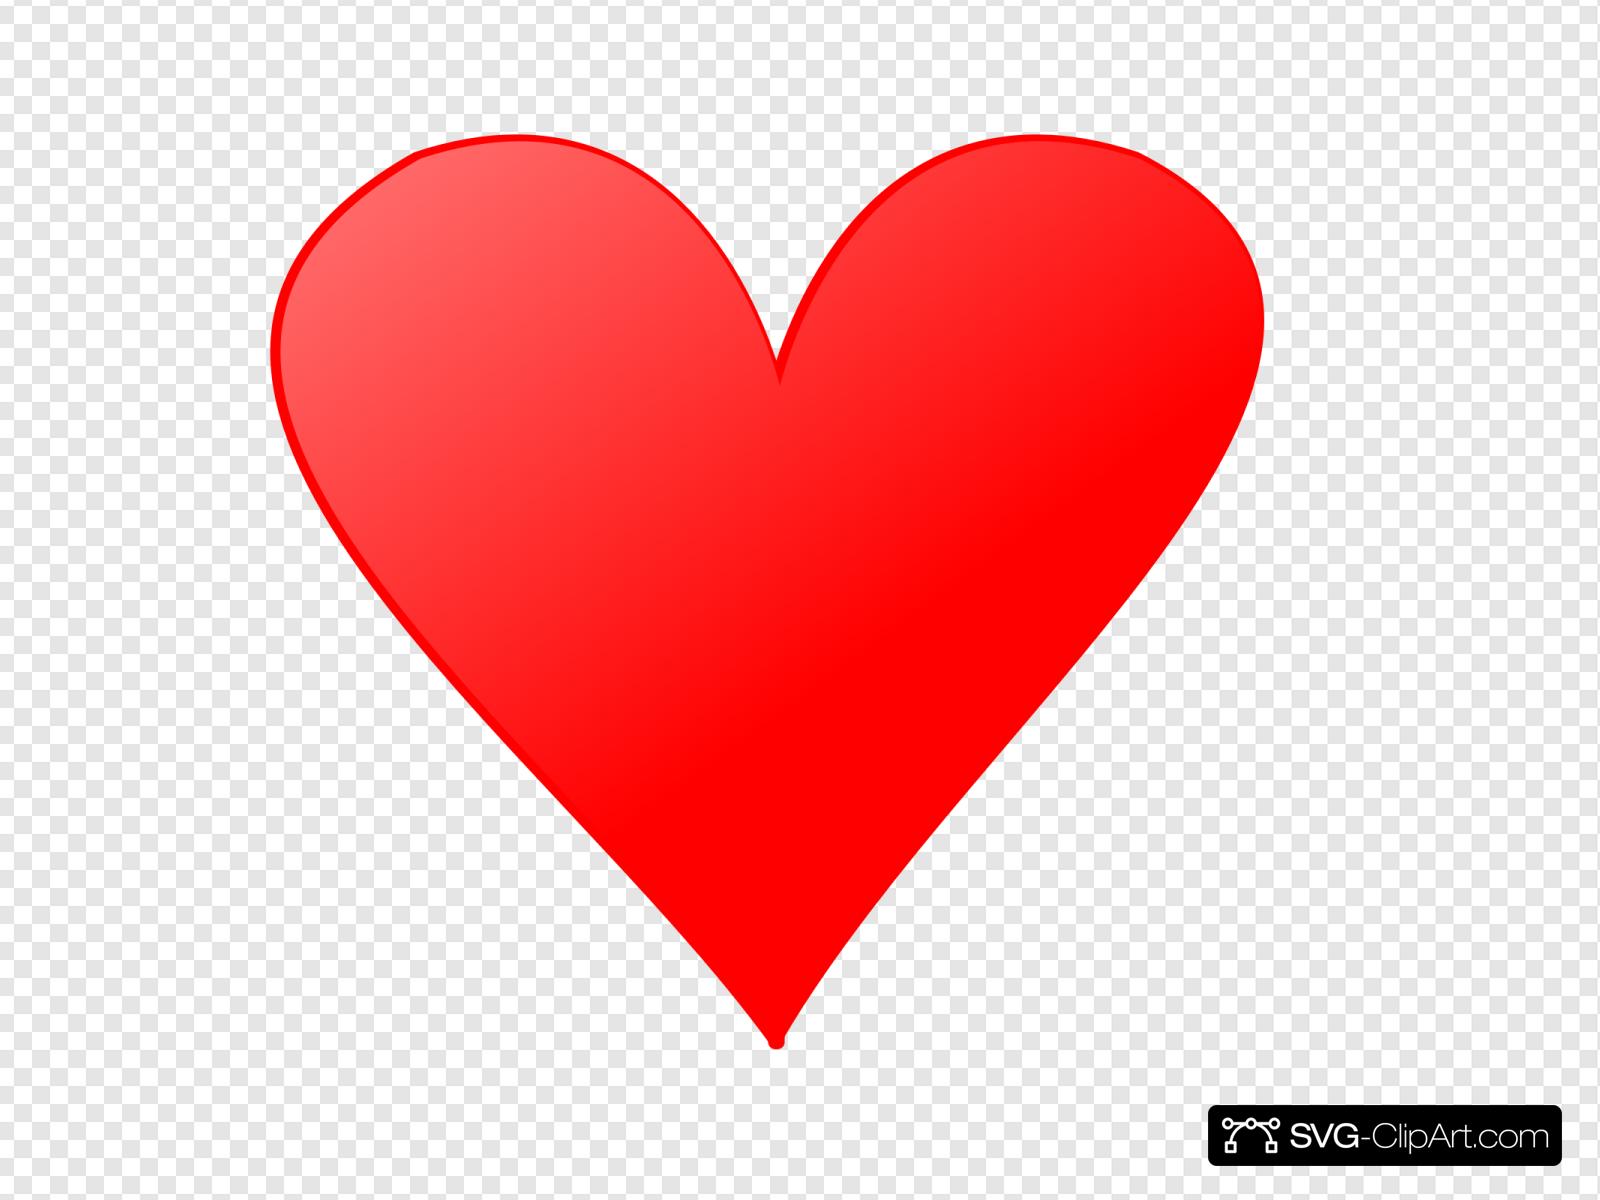 Single Heart Clip art, Icon and SVG.